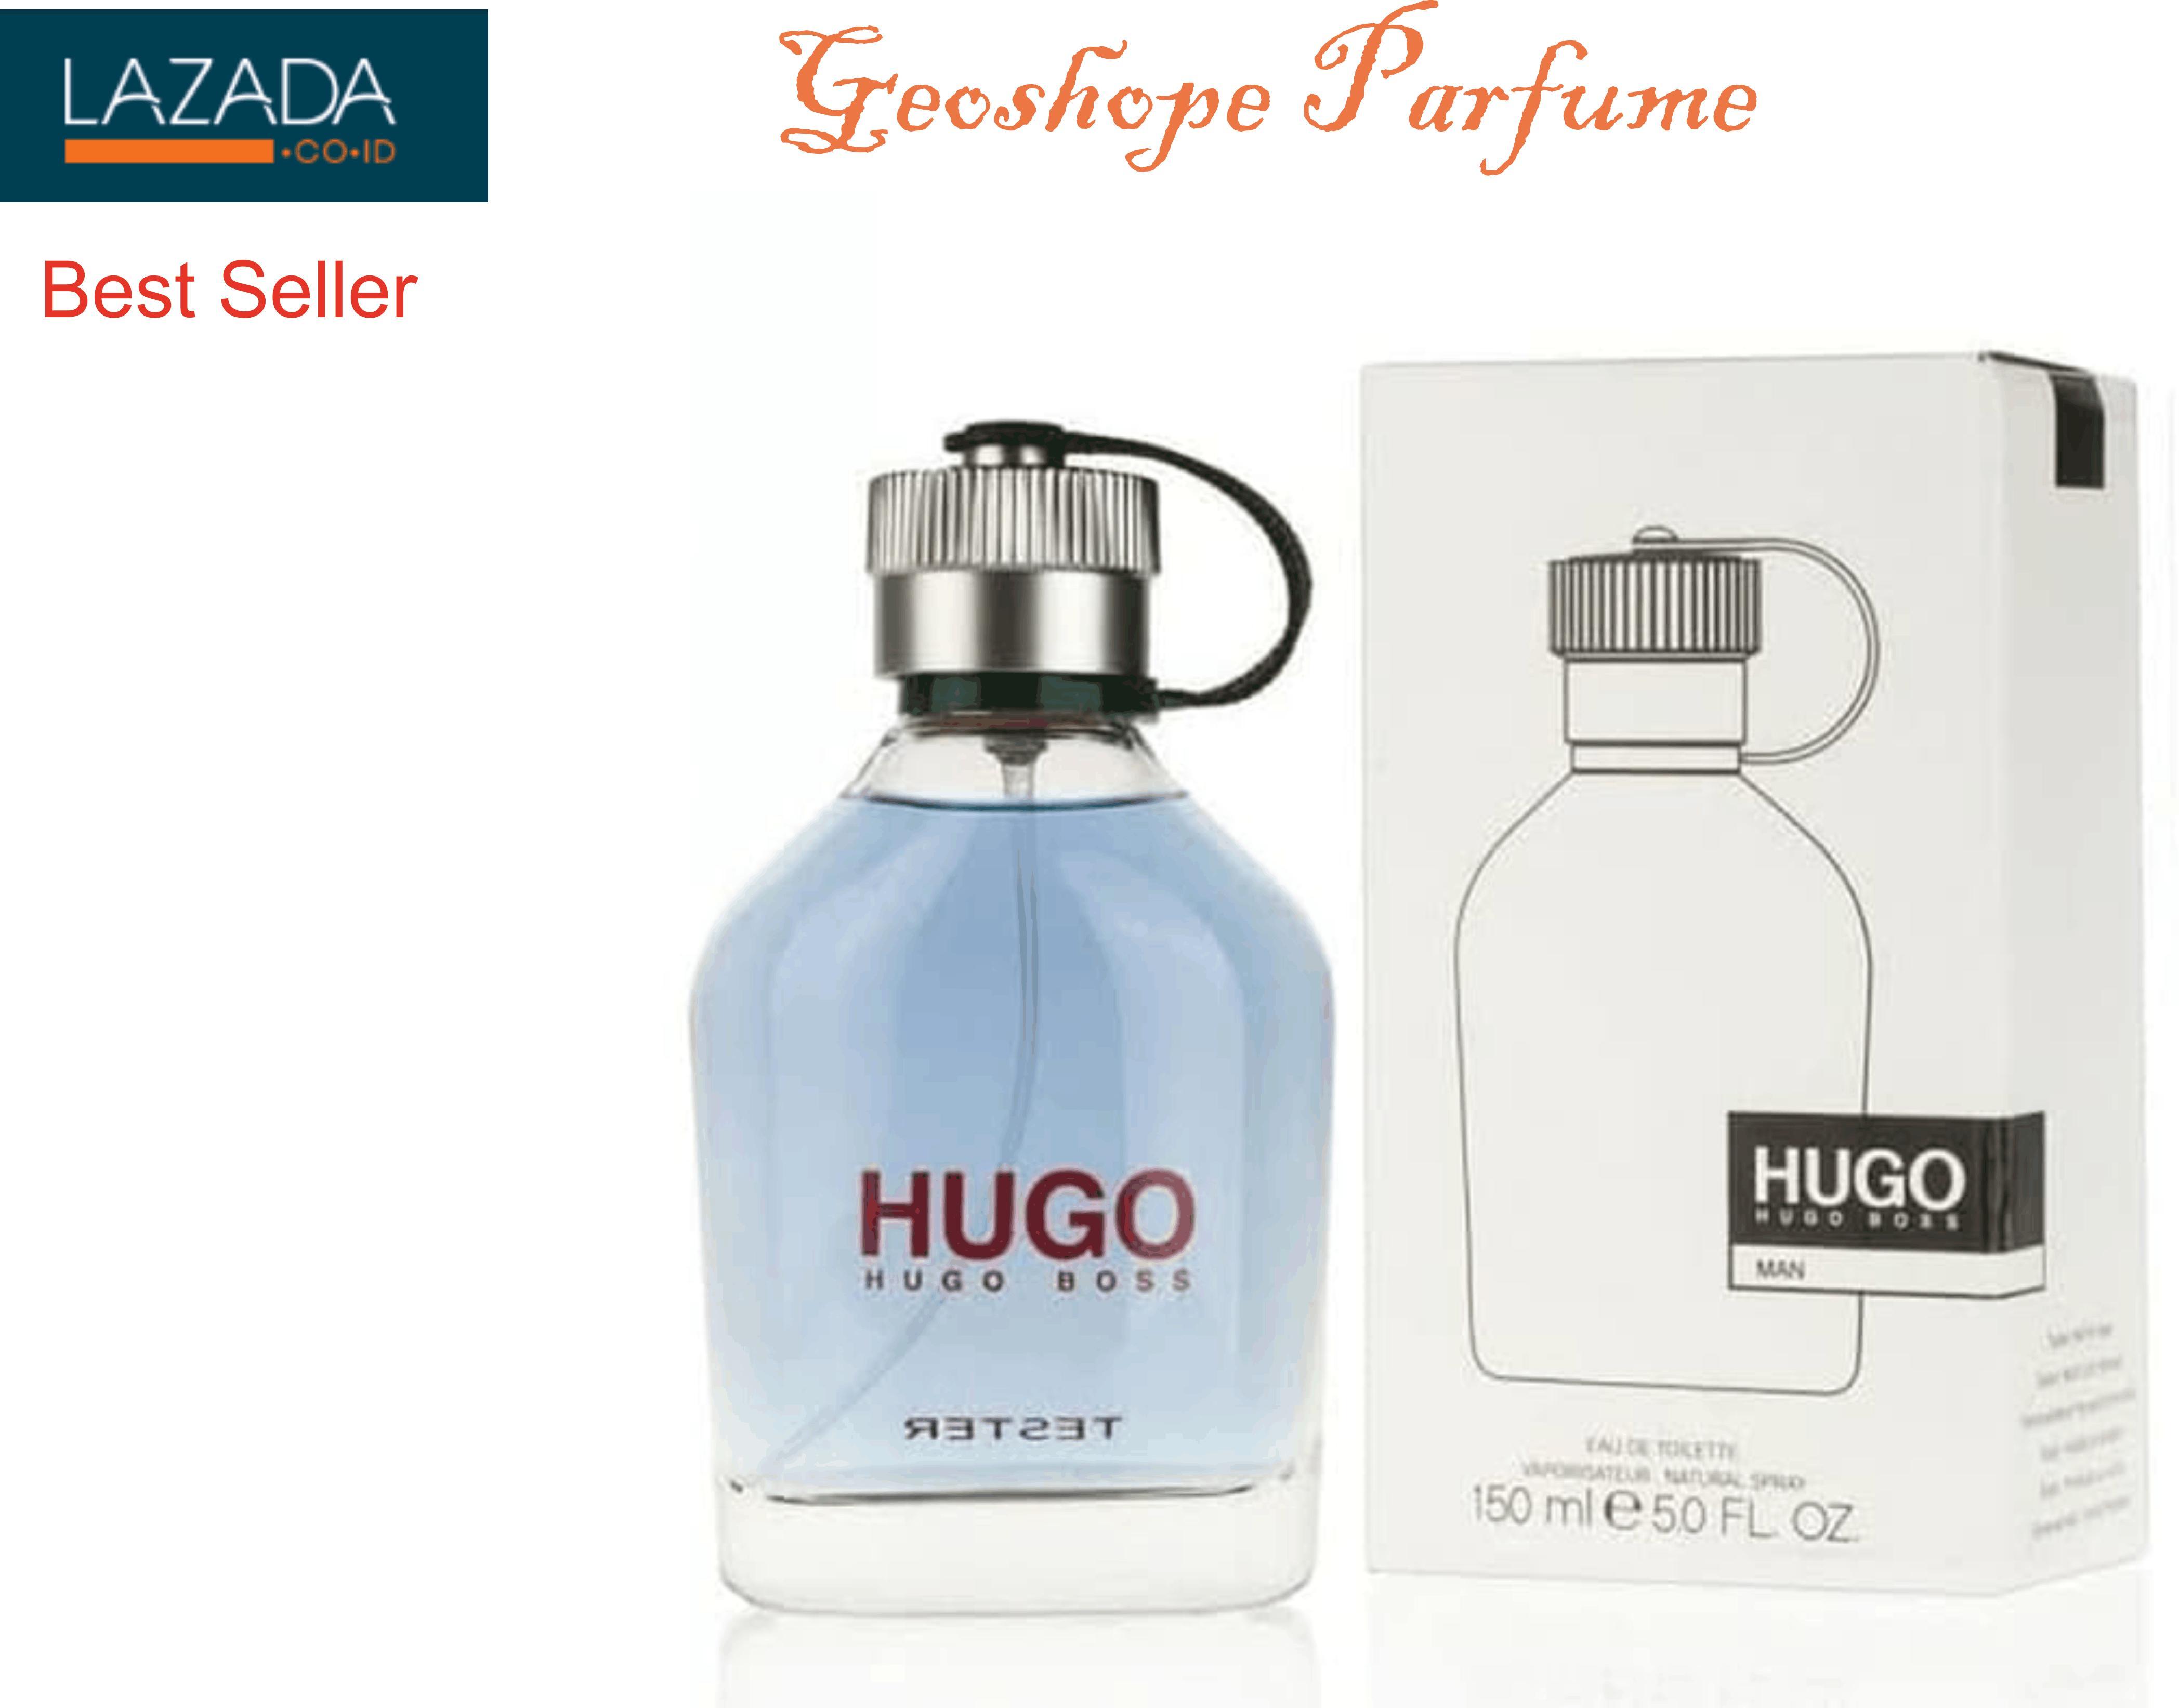 2f14d6711d Indonesia. Parfum Pria Original Parfum Hugo Boss Army tester 150ml /  Jaminan Asli 100% / Lengkap